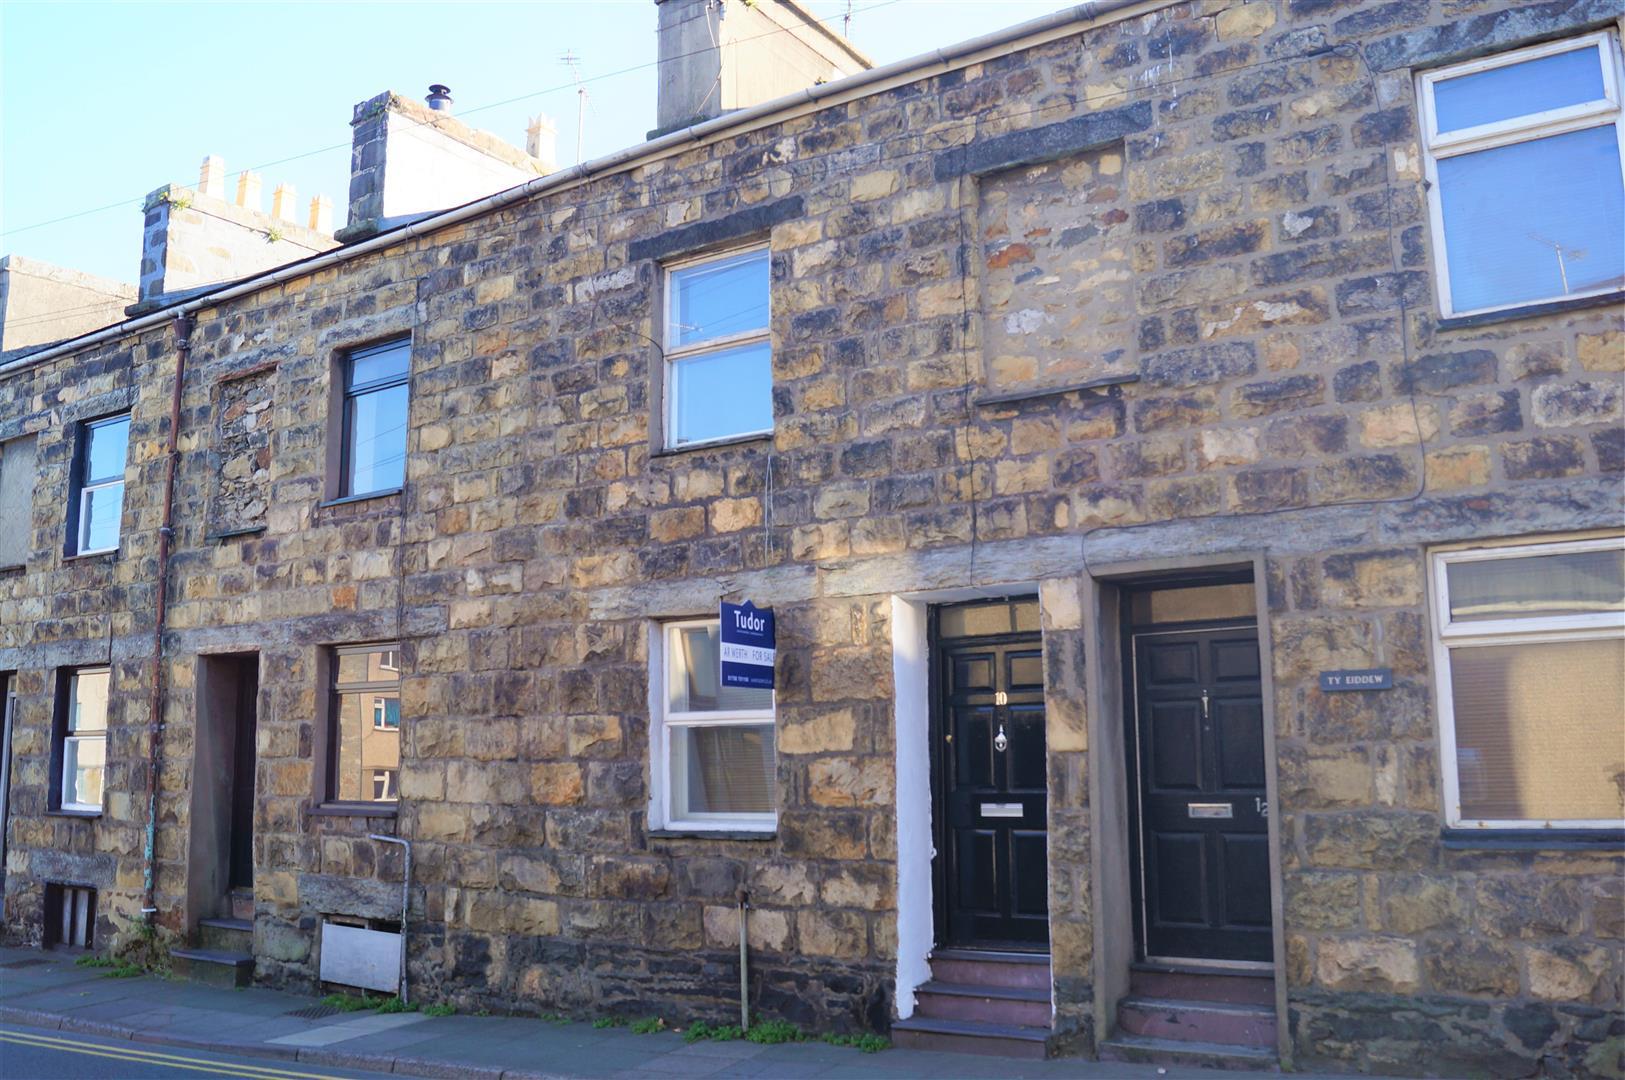 High Street, Pwllheli - £114,000